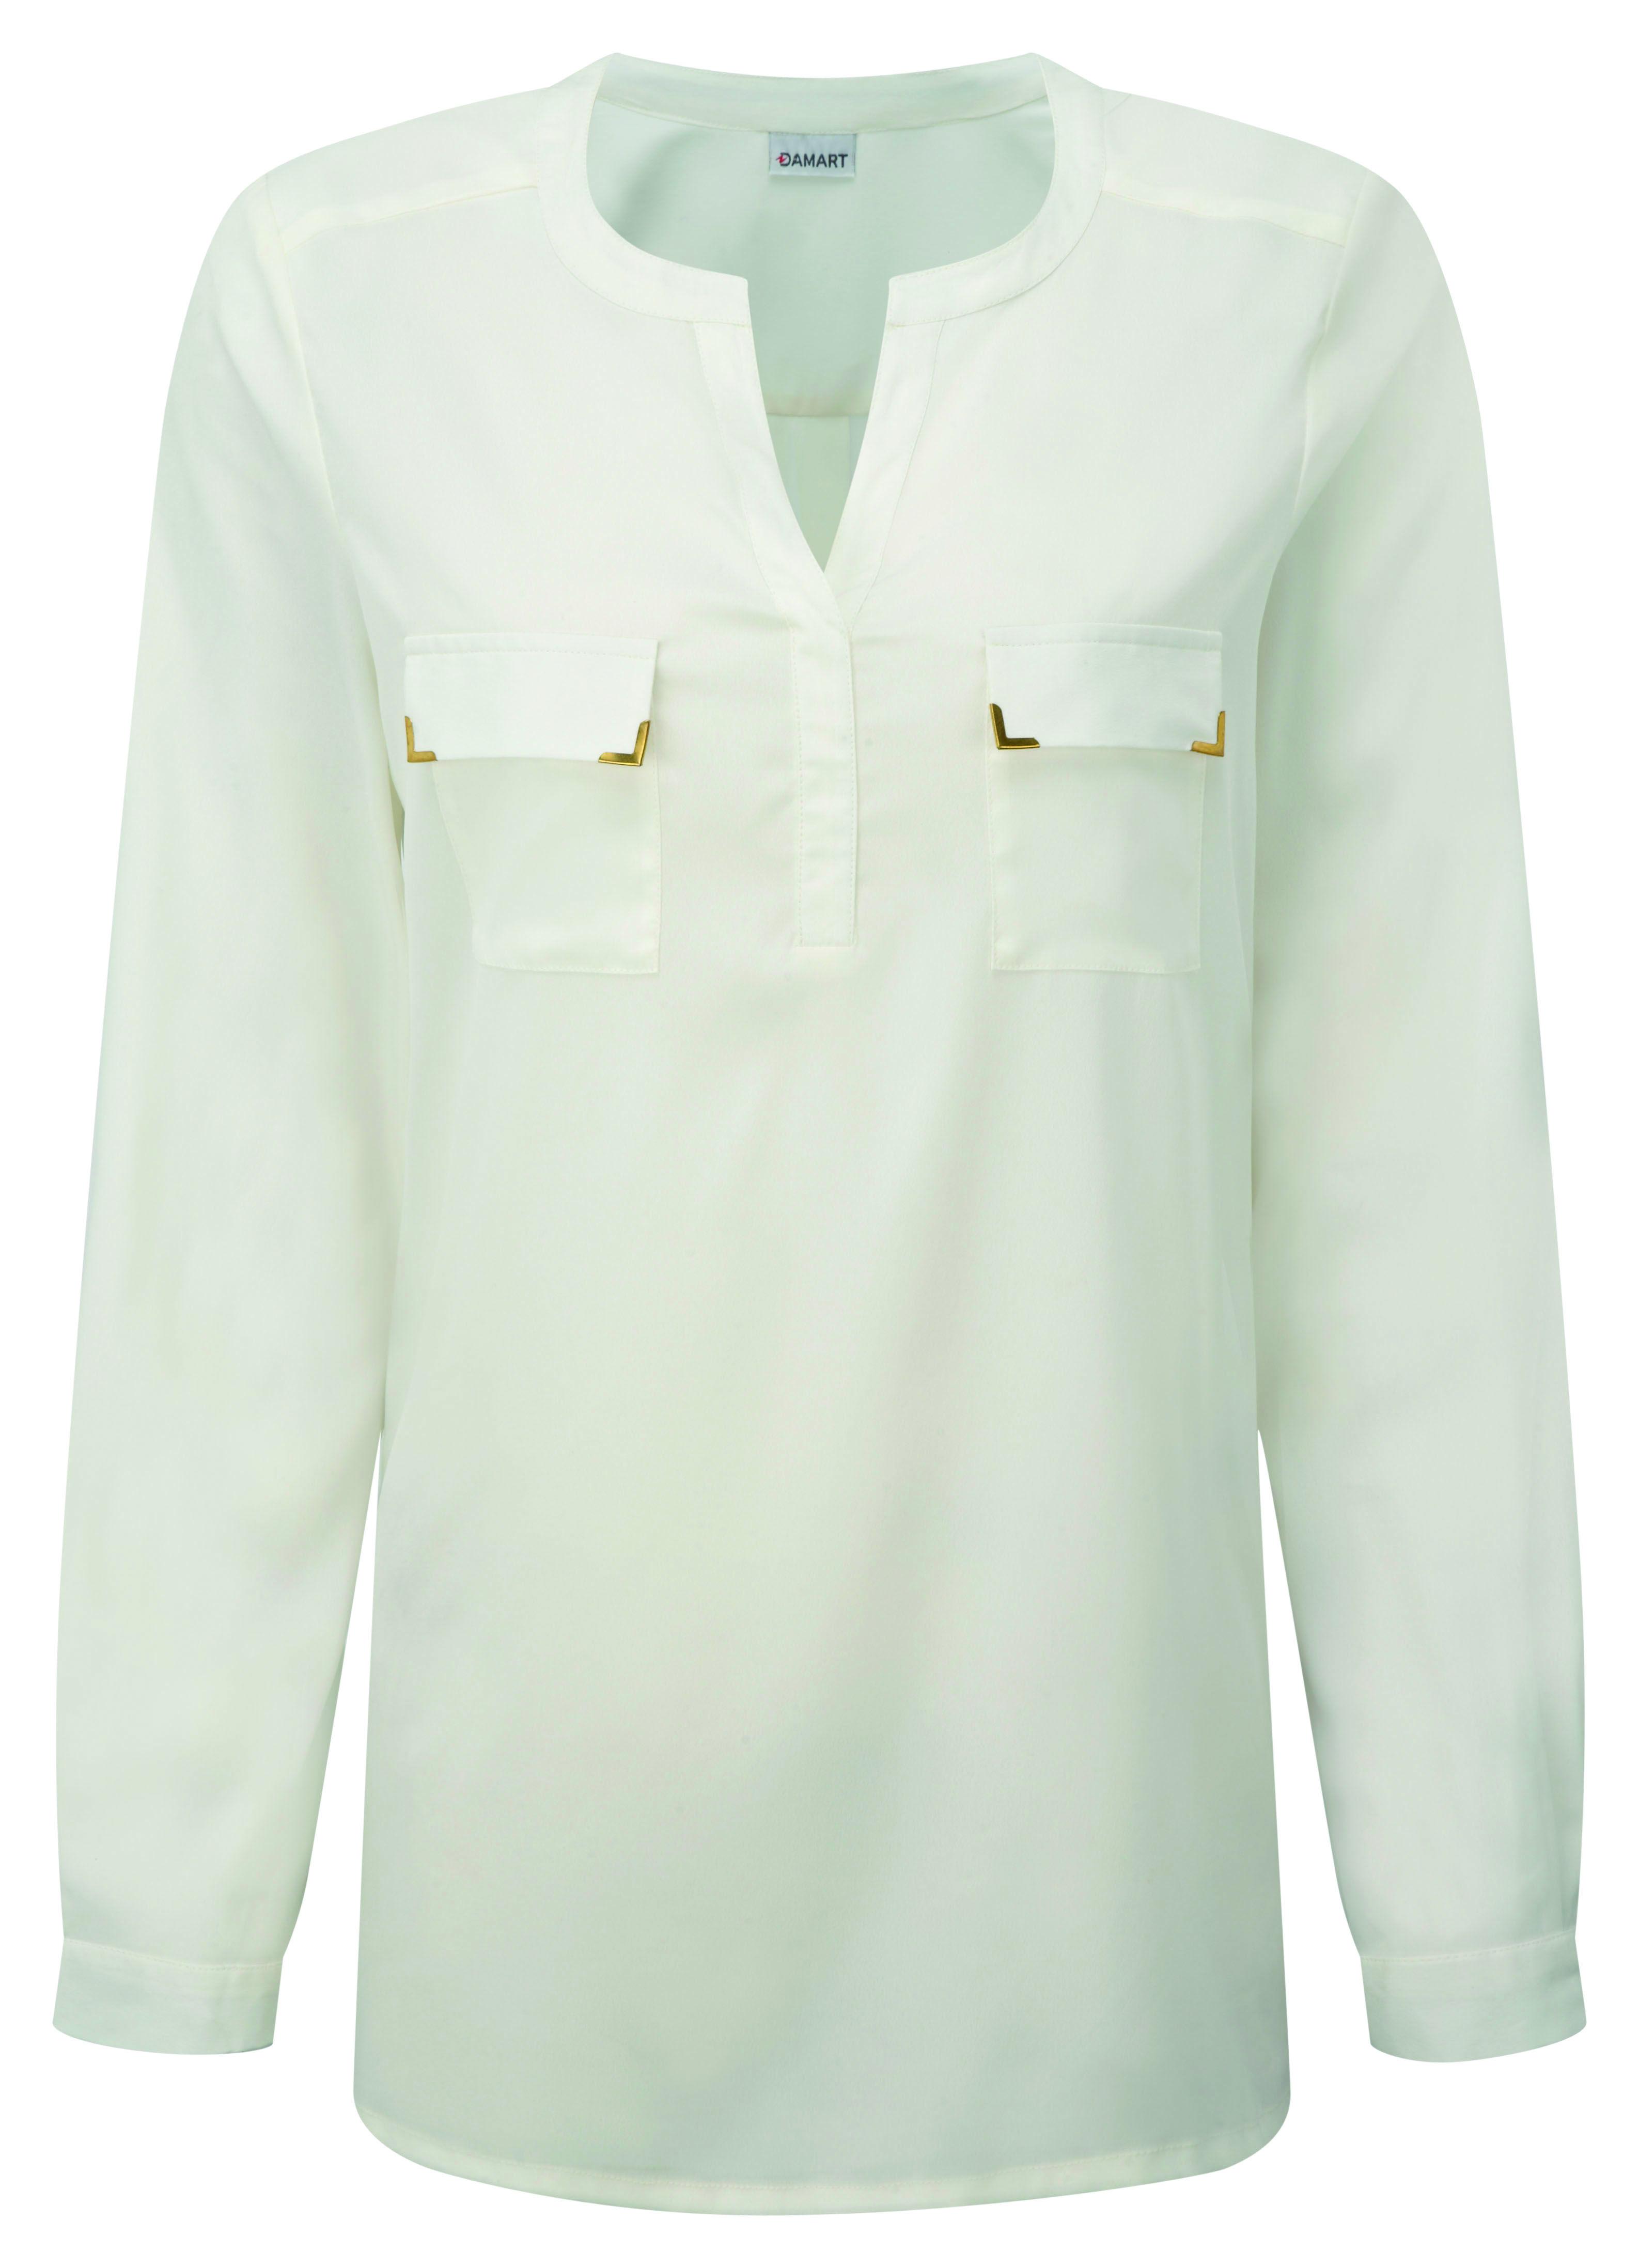 01e8f93b85 Print Tunic Blouse | SS16 | Tunic blouse, Tunic, Blouse